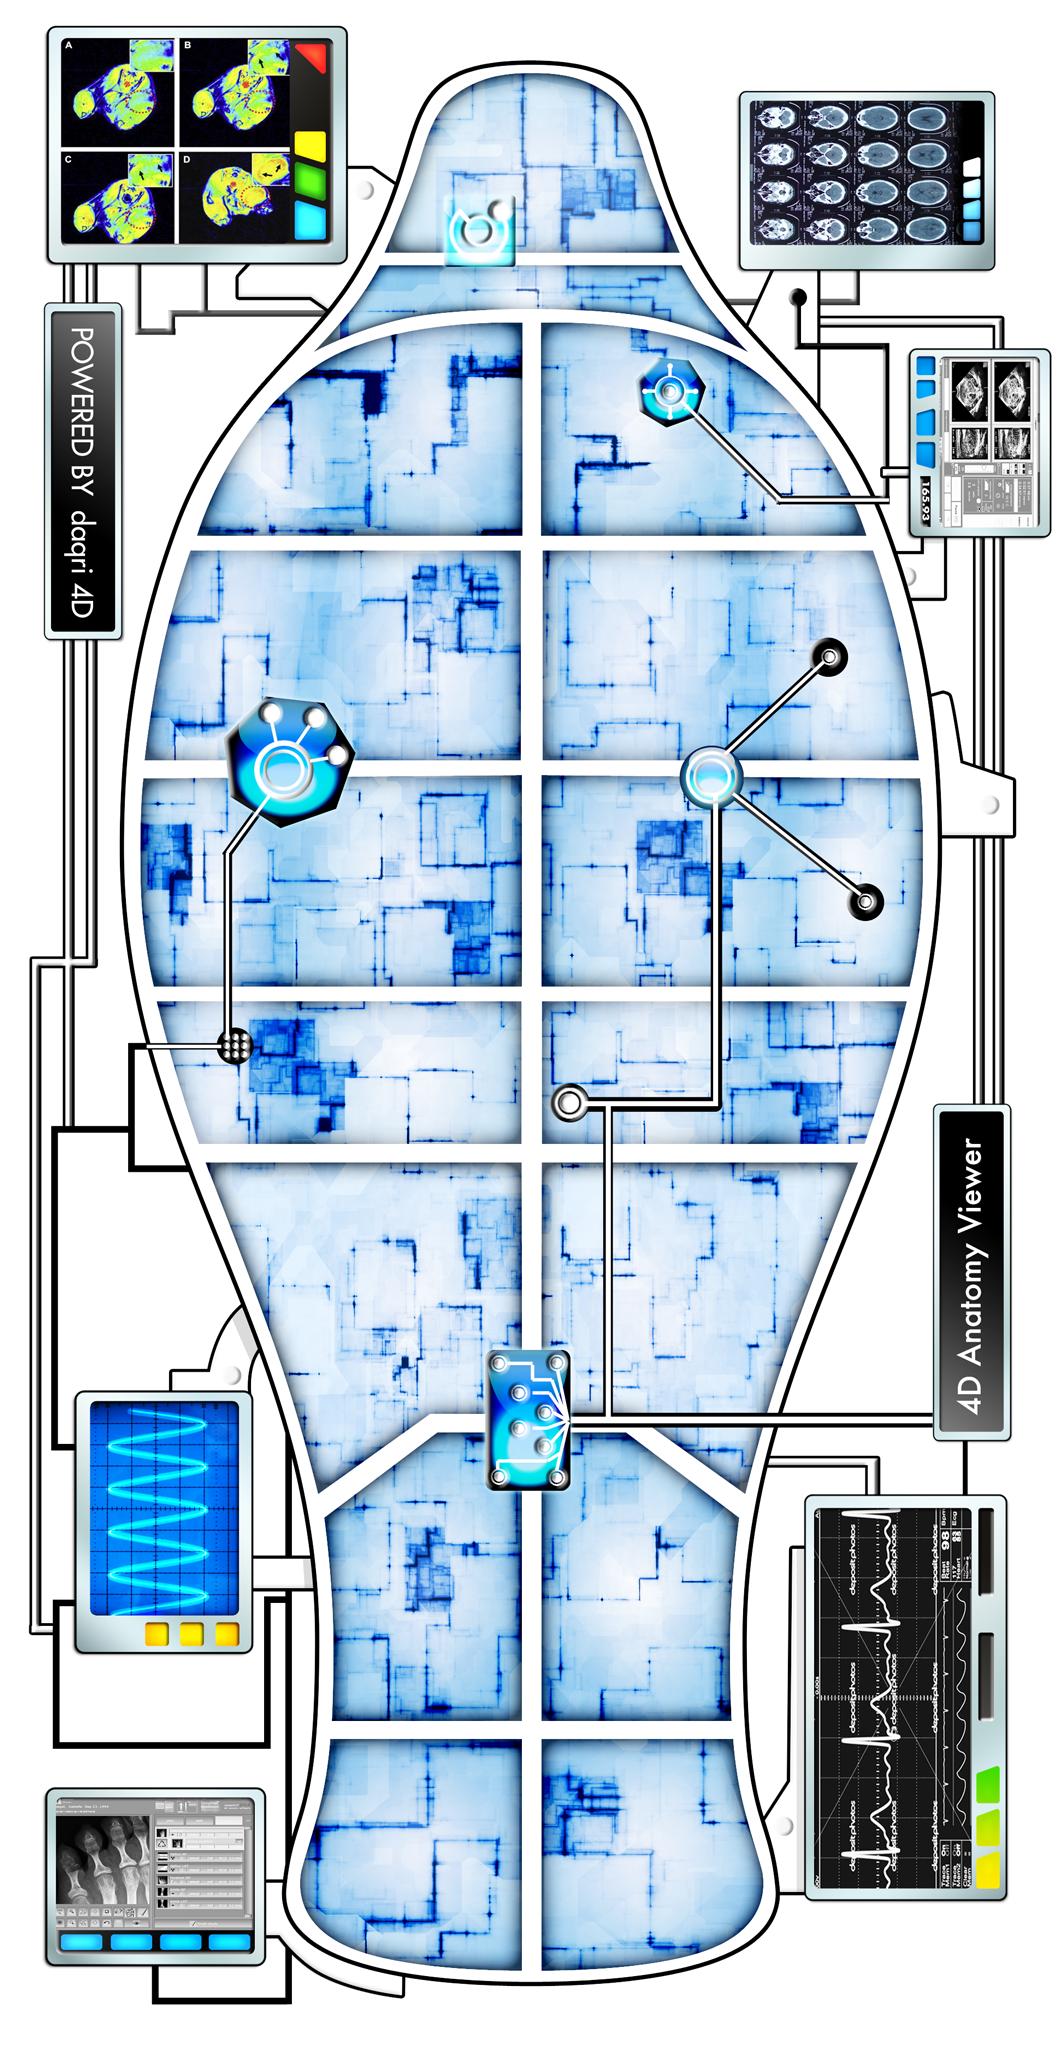 Daqri 4 d human body simulation | Student Sites | Pinterest